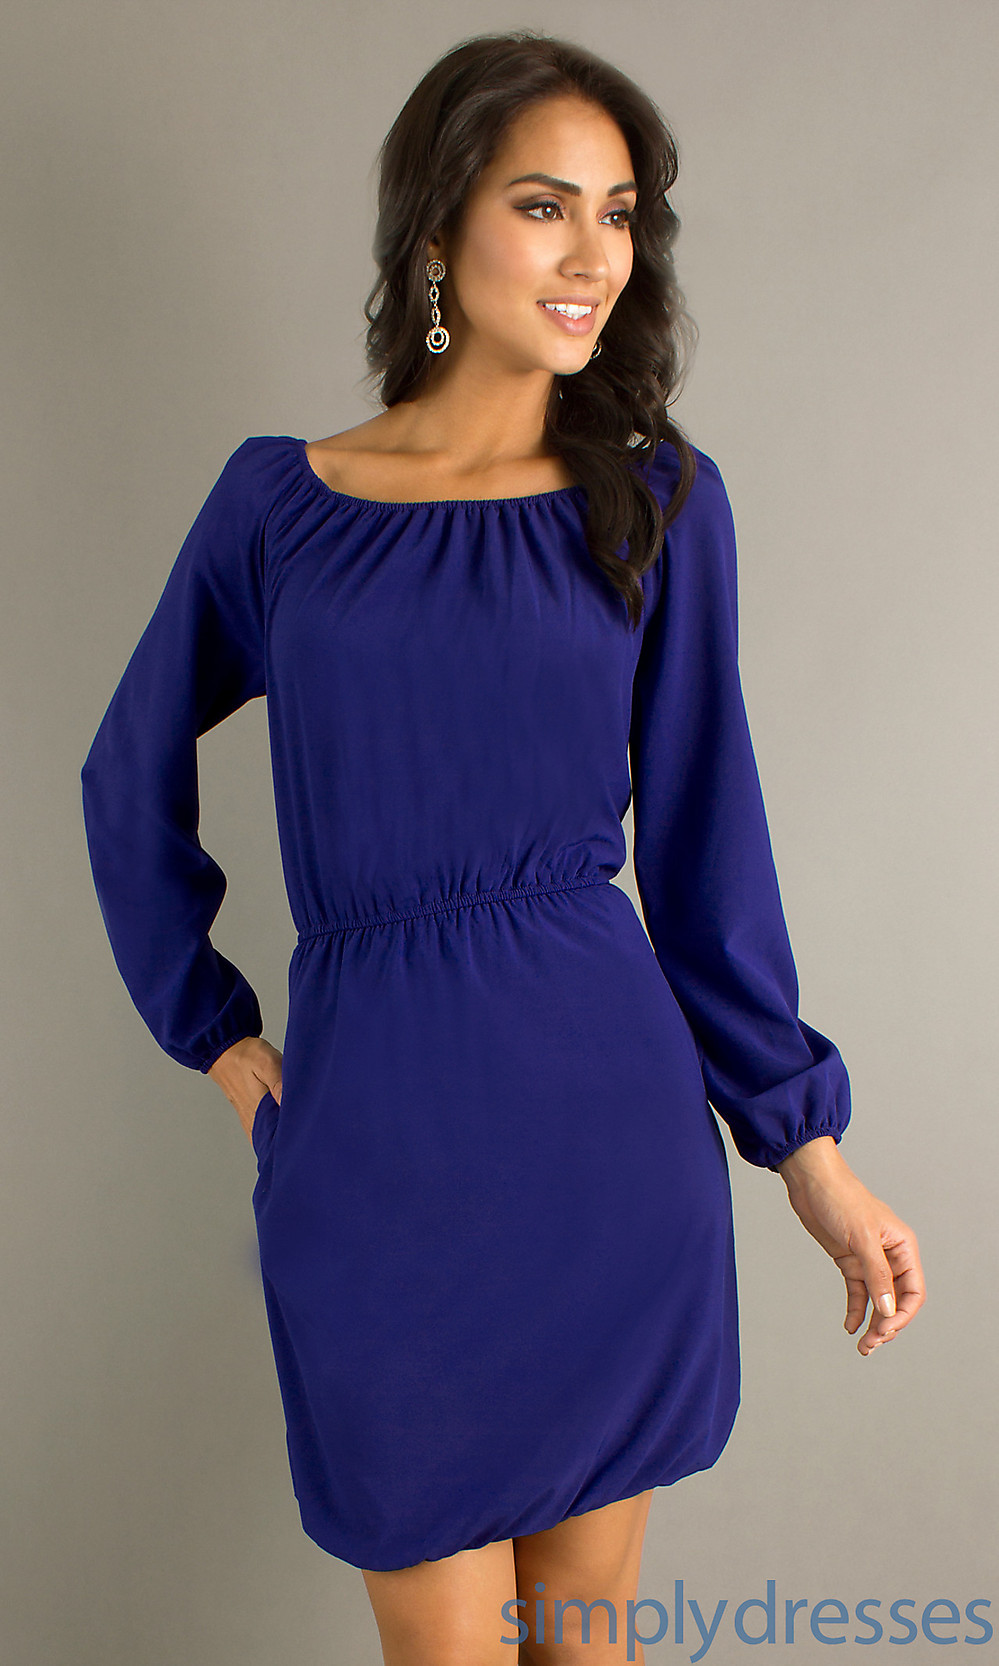 long sleeve dress casual photo - 1